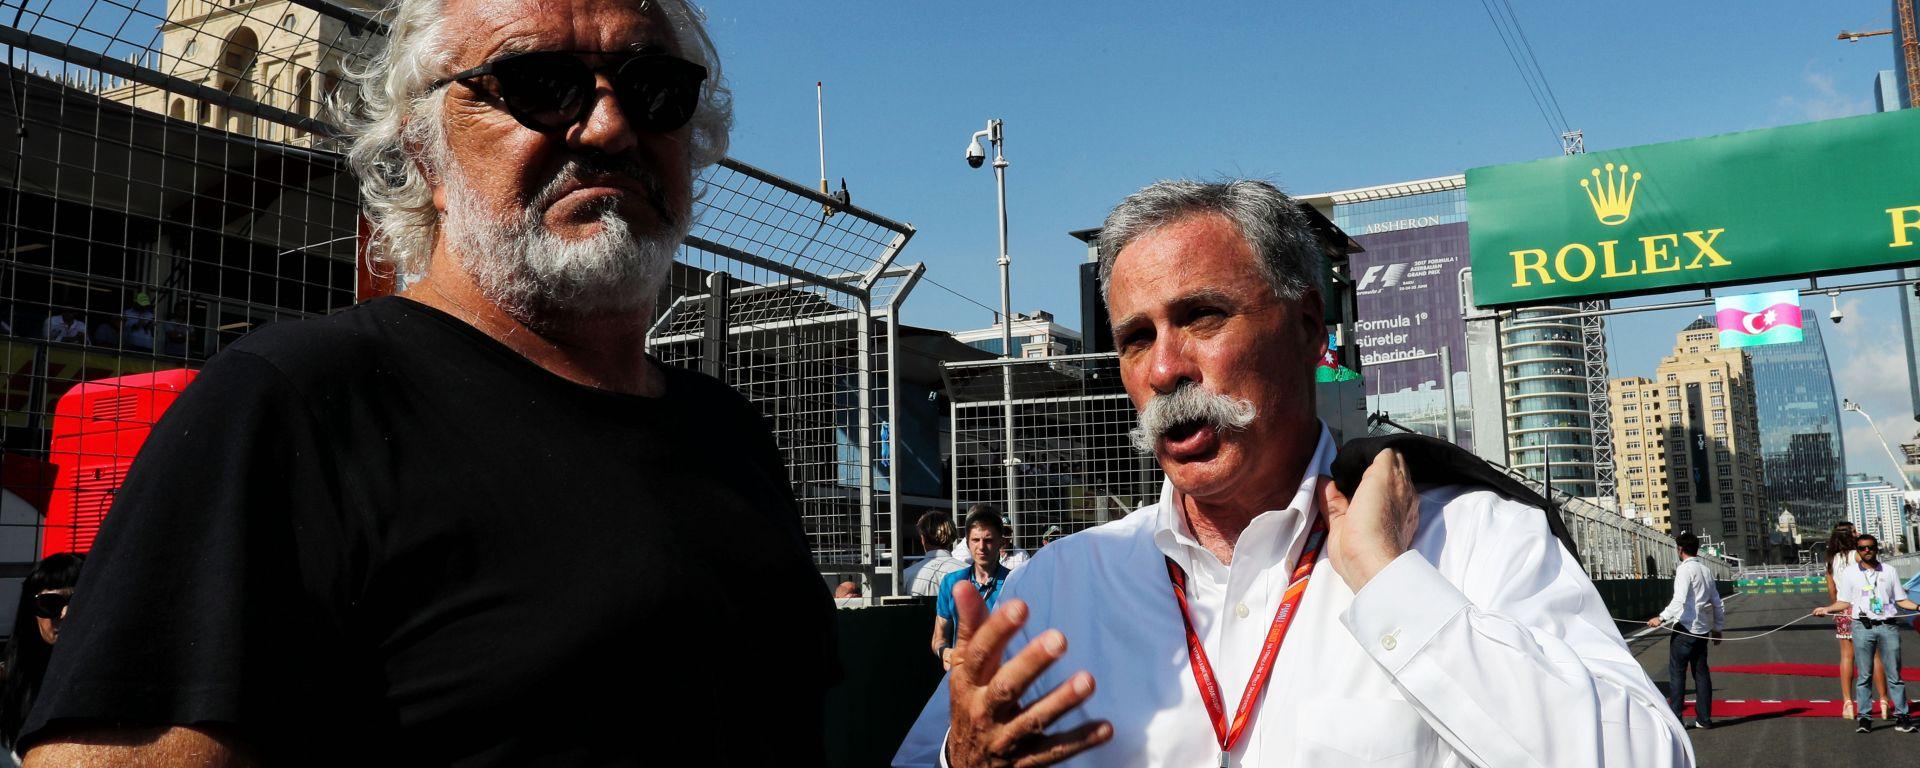 F1 GP Azerbaijan 2017, Baku: Flavio Briatore con Chase Carey (Liberty Media)